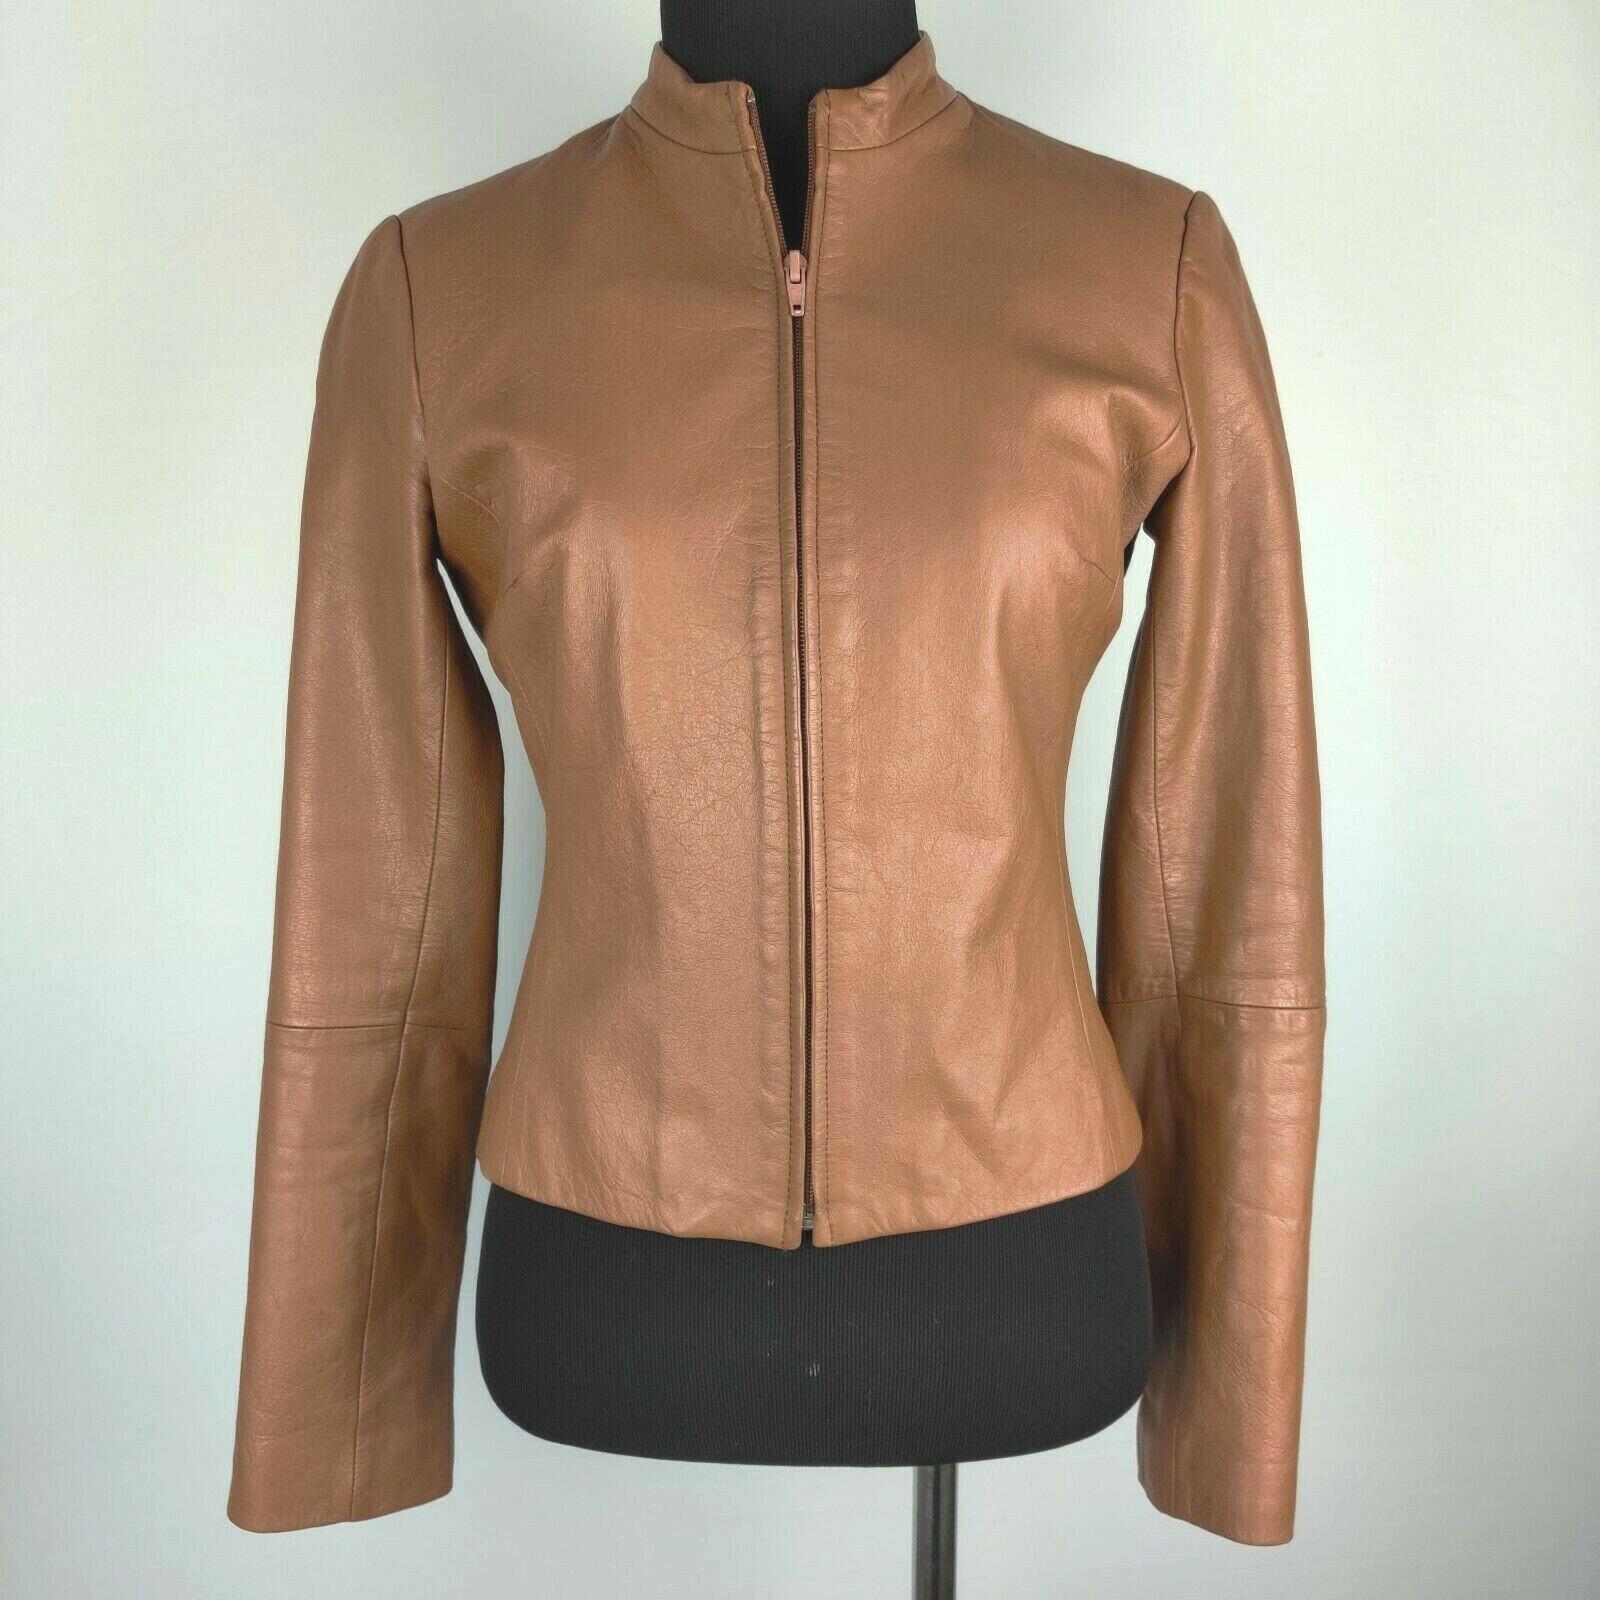 $268 NEW NWT Womens BCBG ASYMMETRICAL ZIP LONG FAUX LEATHER MOTO JACKET COAT S